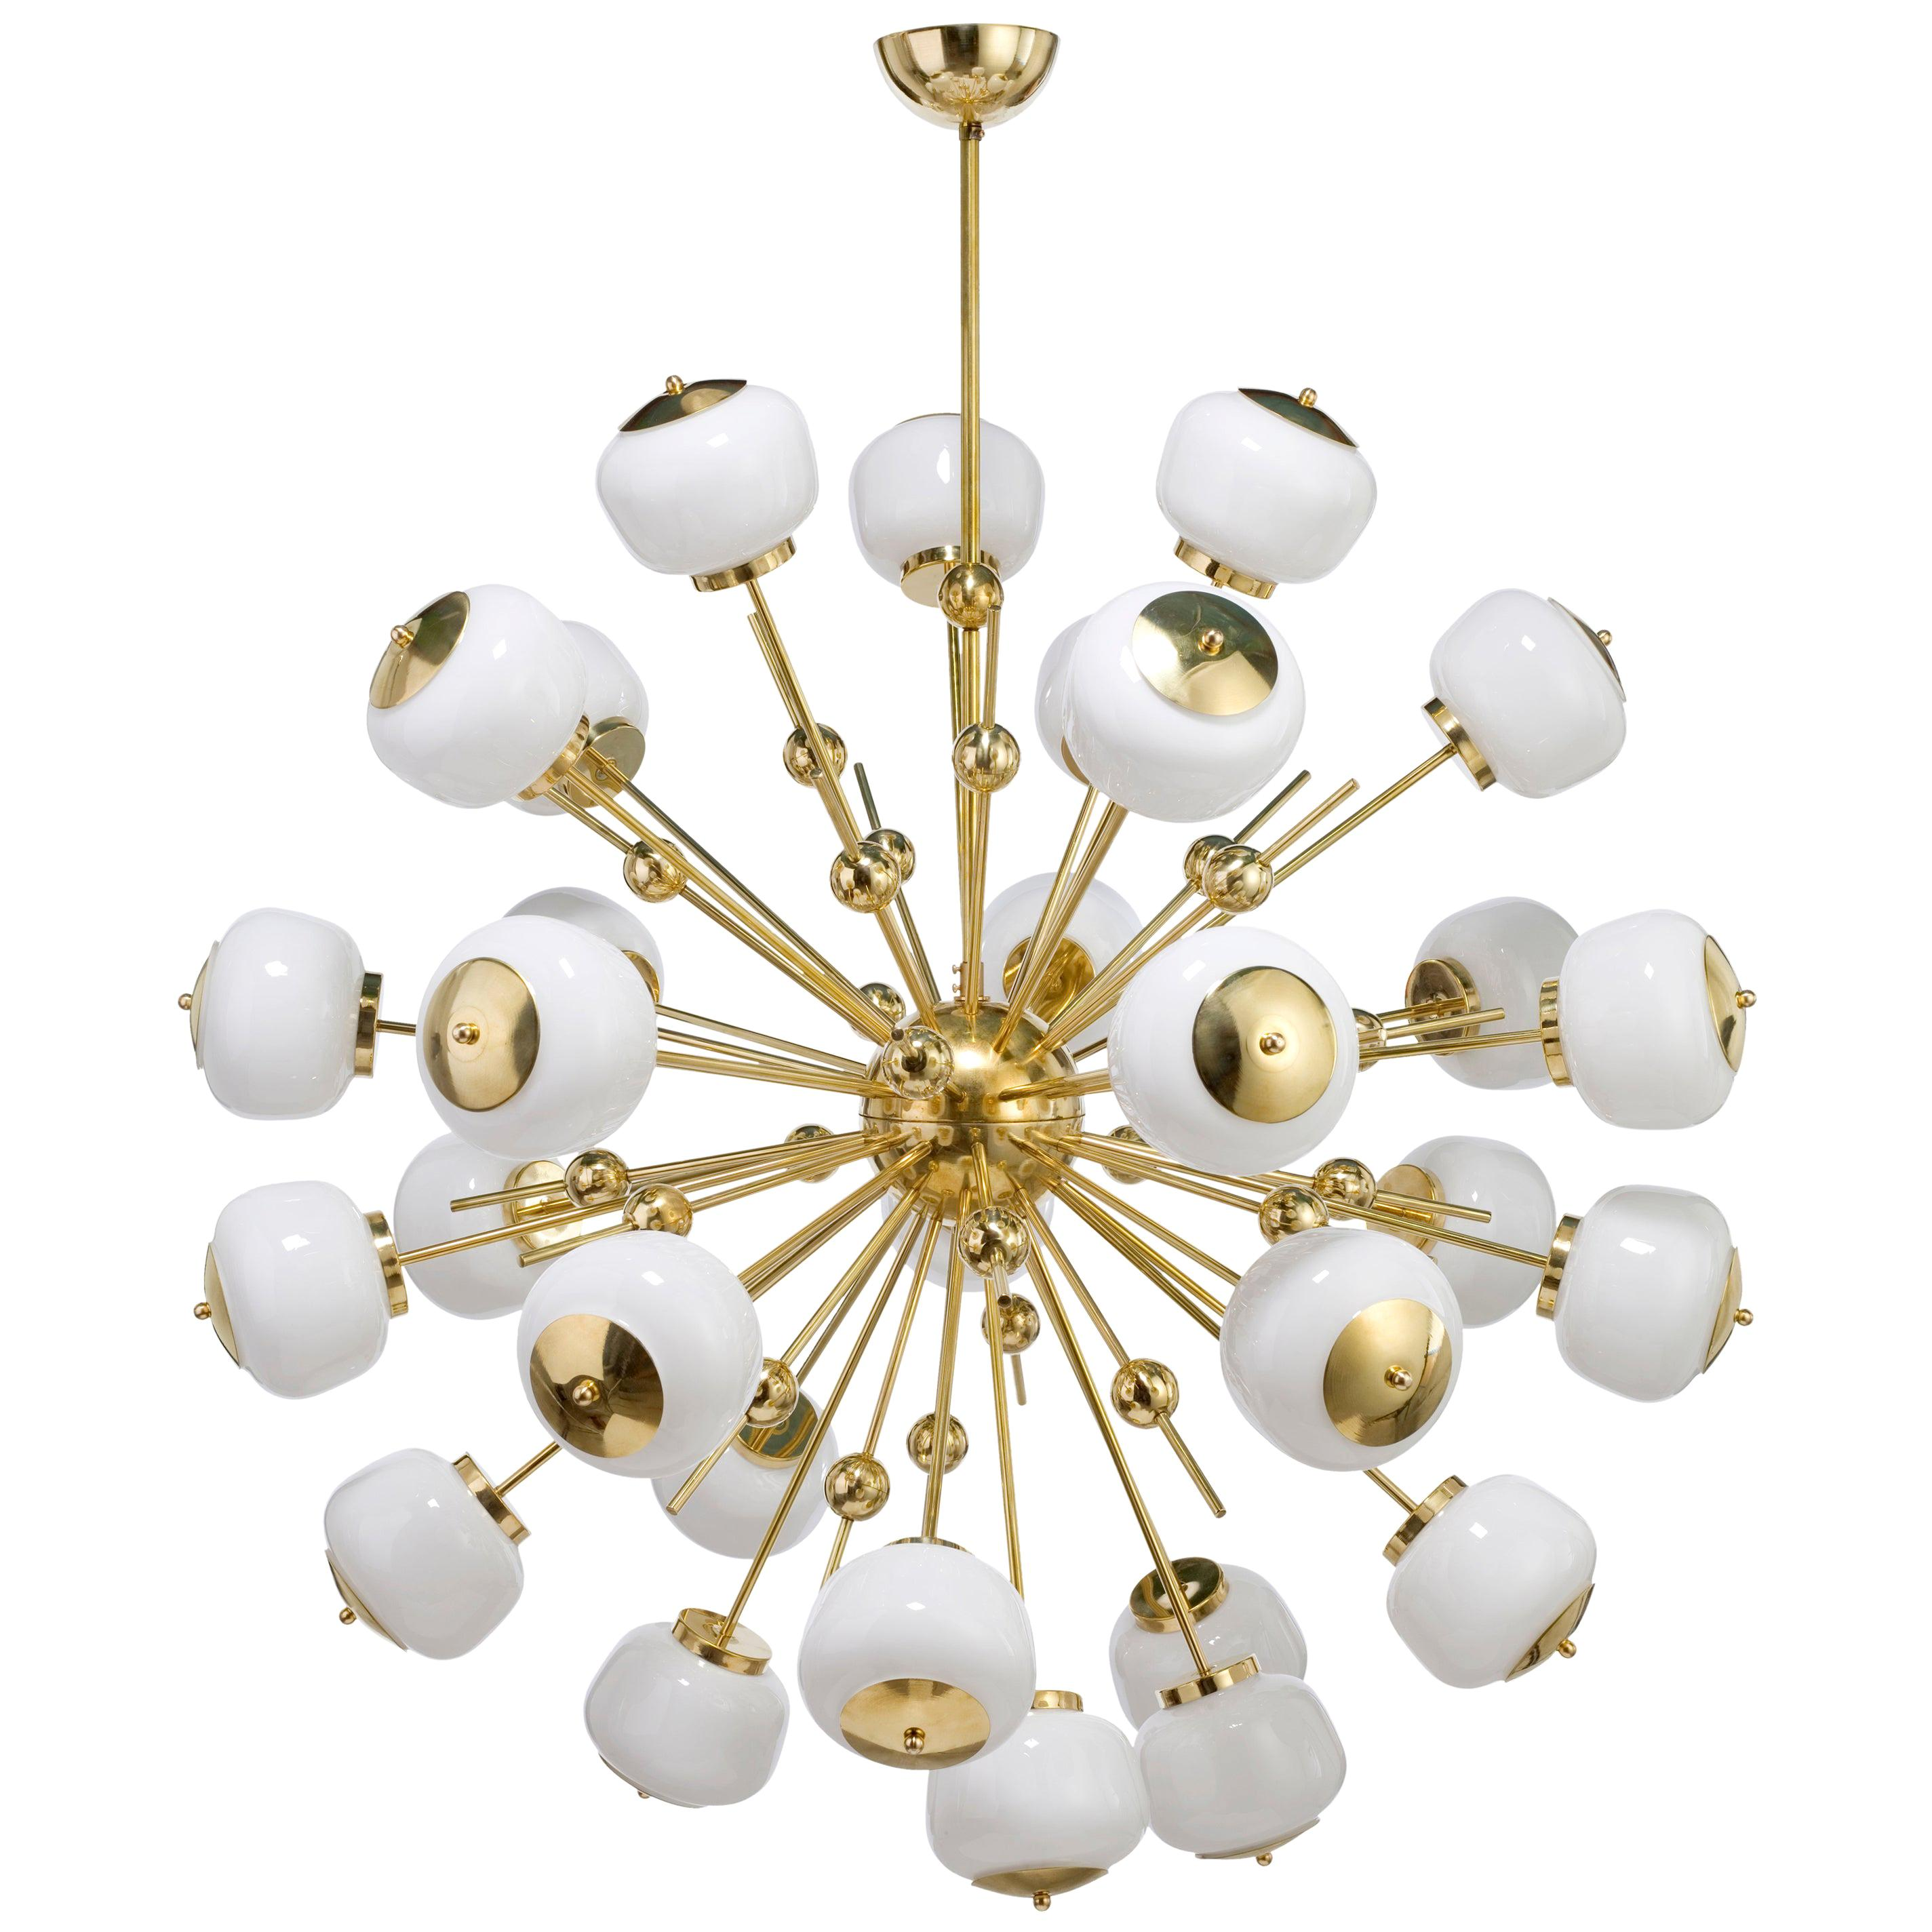 Mid-Century Modern Style, Sputnik Chandelier with Murano Glass Orbs